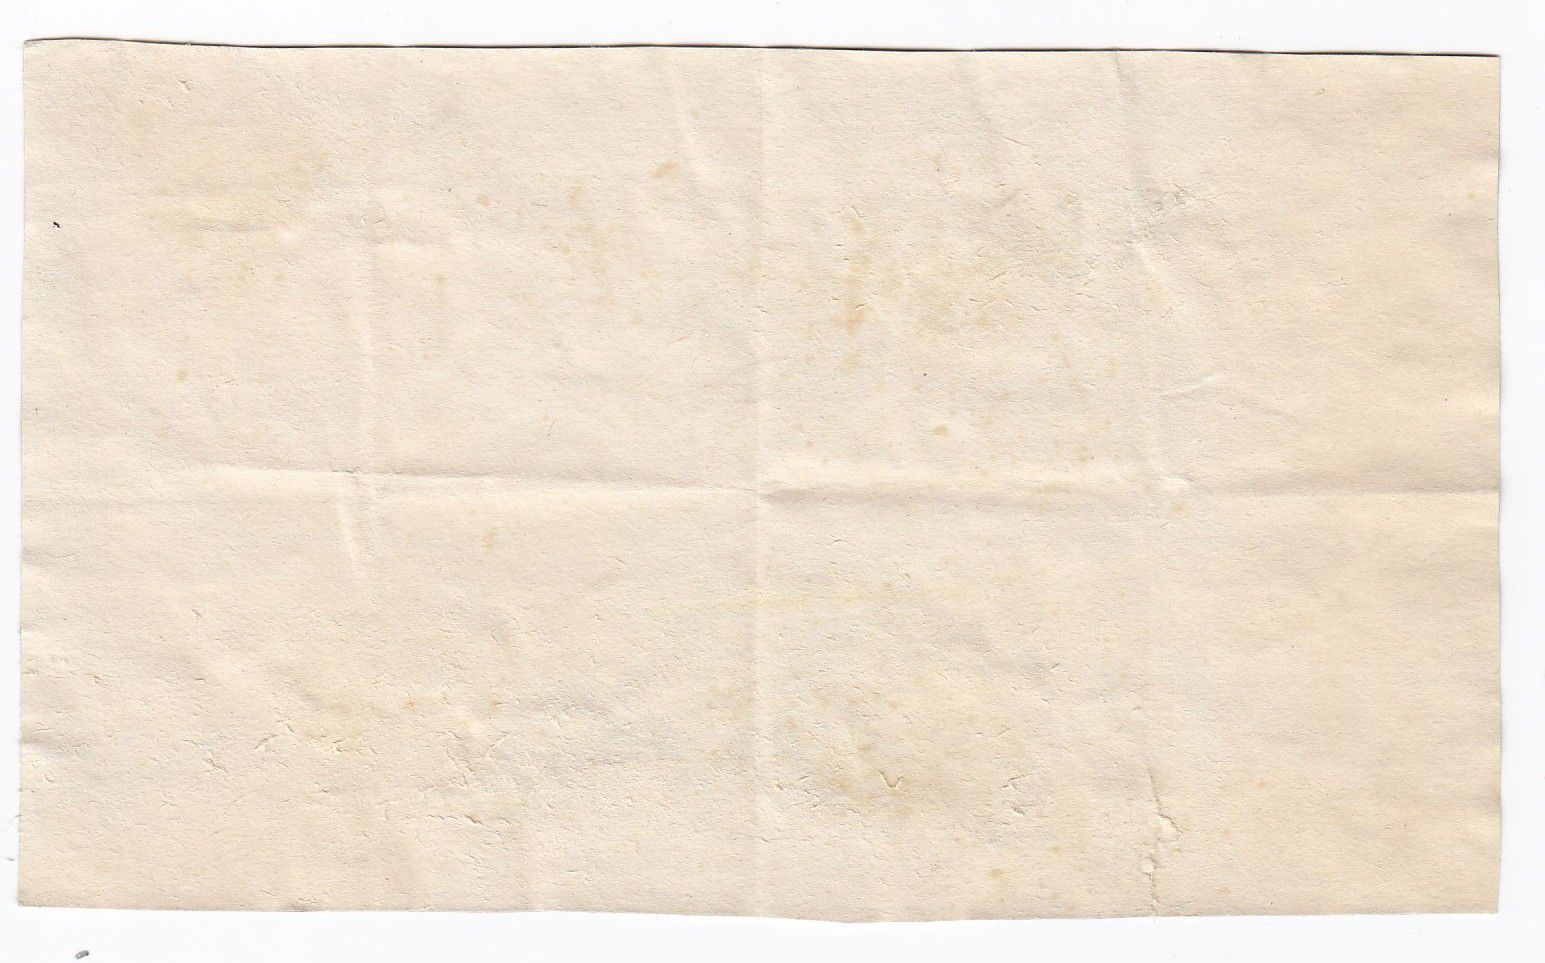 France 400 Livres 21-11-1792 - Sign. Bertaut - Serial 1222 - Fine